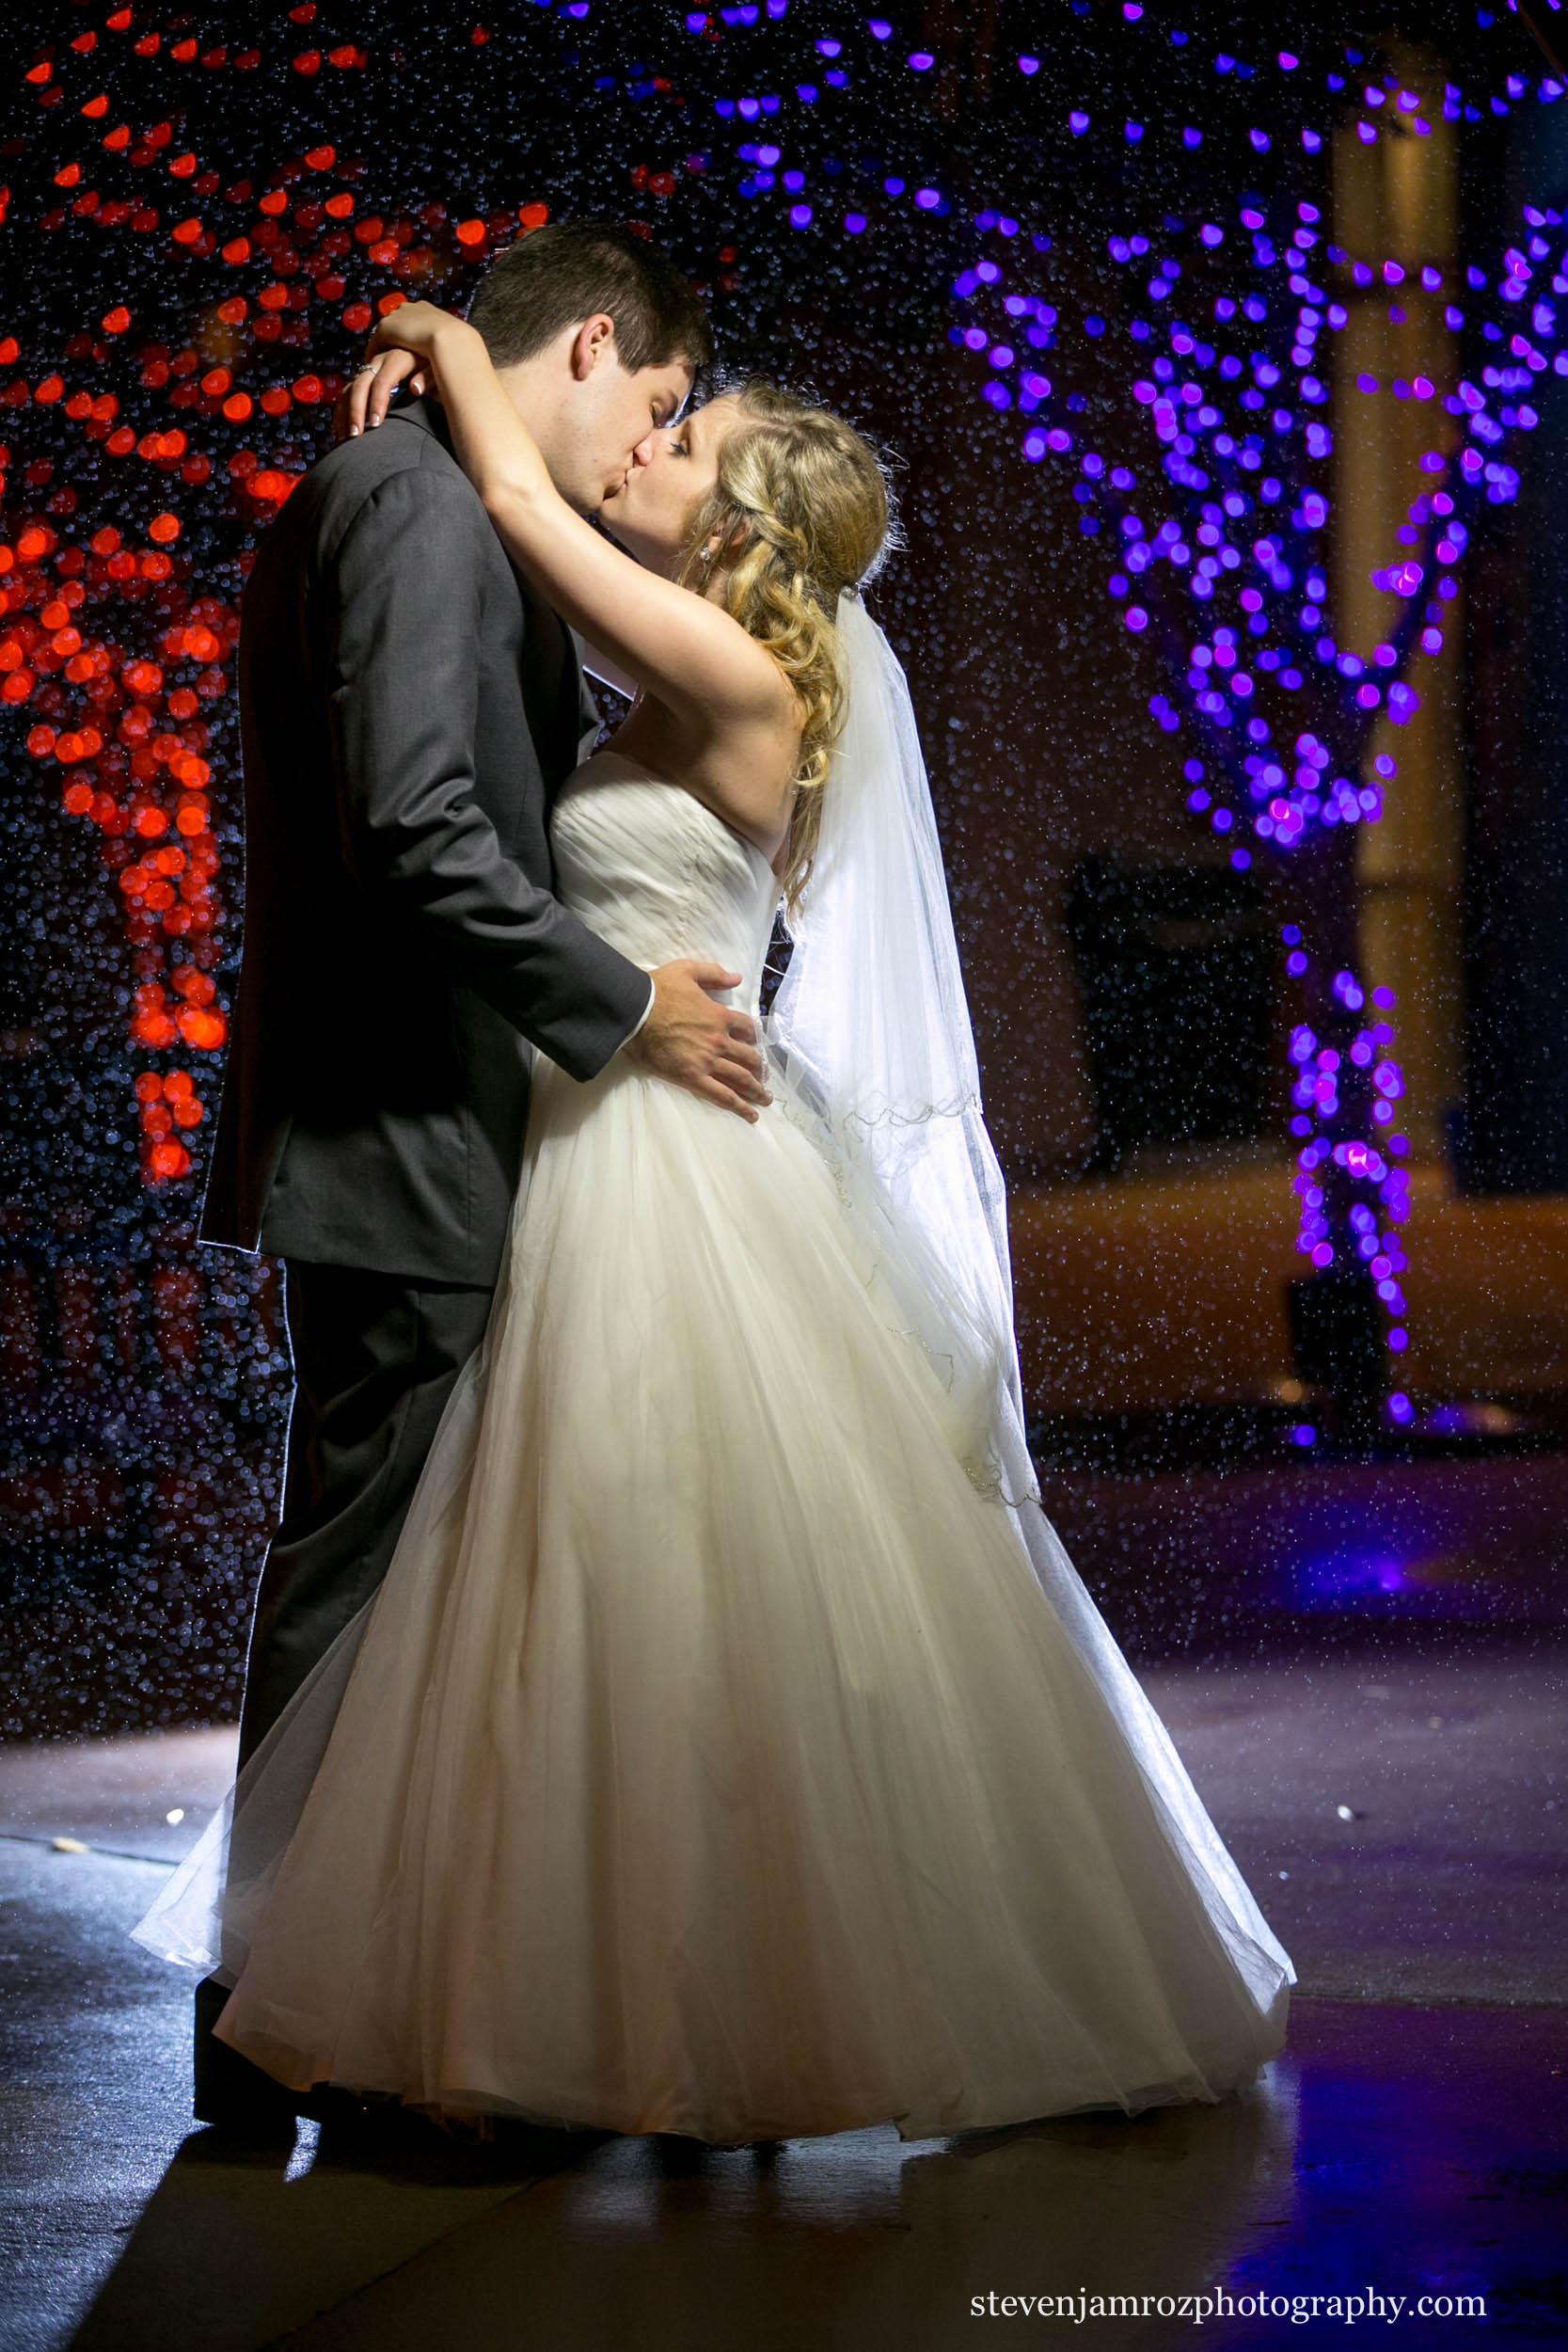 raleigh-nc-marbles-meseum-wedding-steven-jamroz-photography-0172.jpg